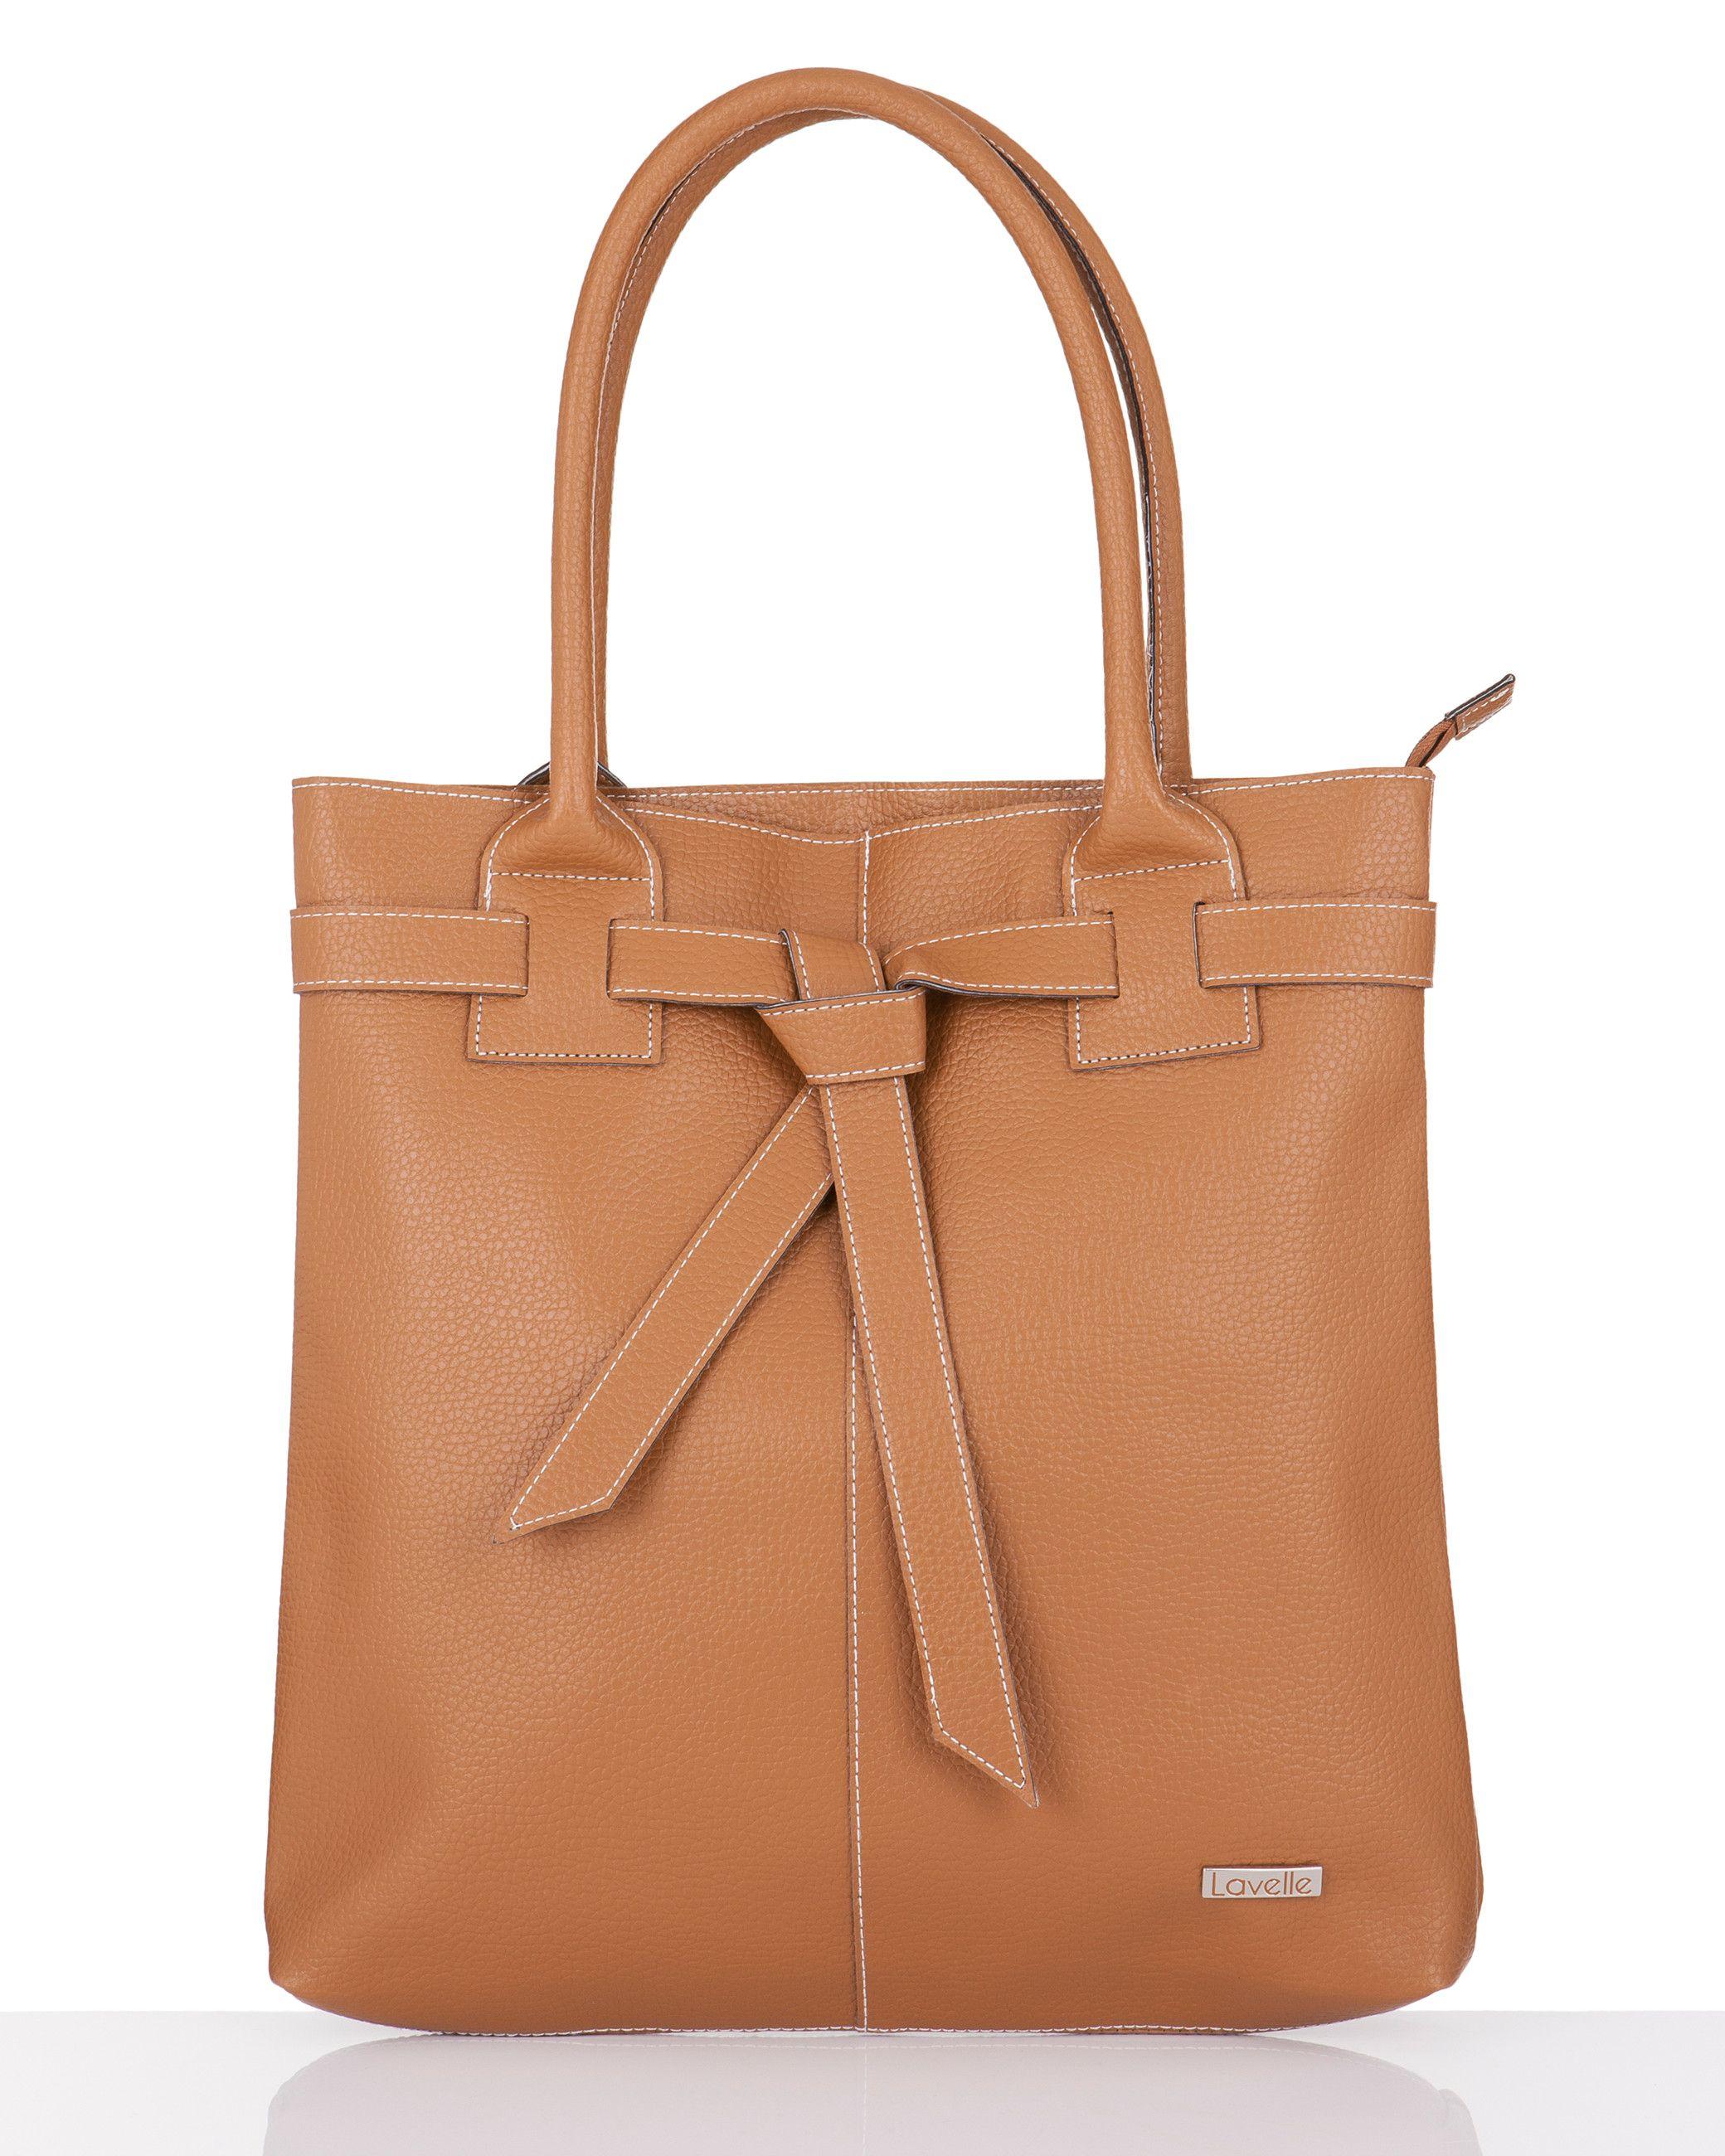 Lavelle | Women's Fashion | Tasche in Lederoptik | #HSE24 ...